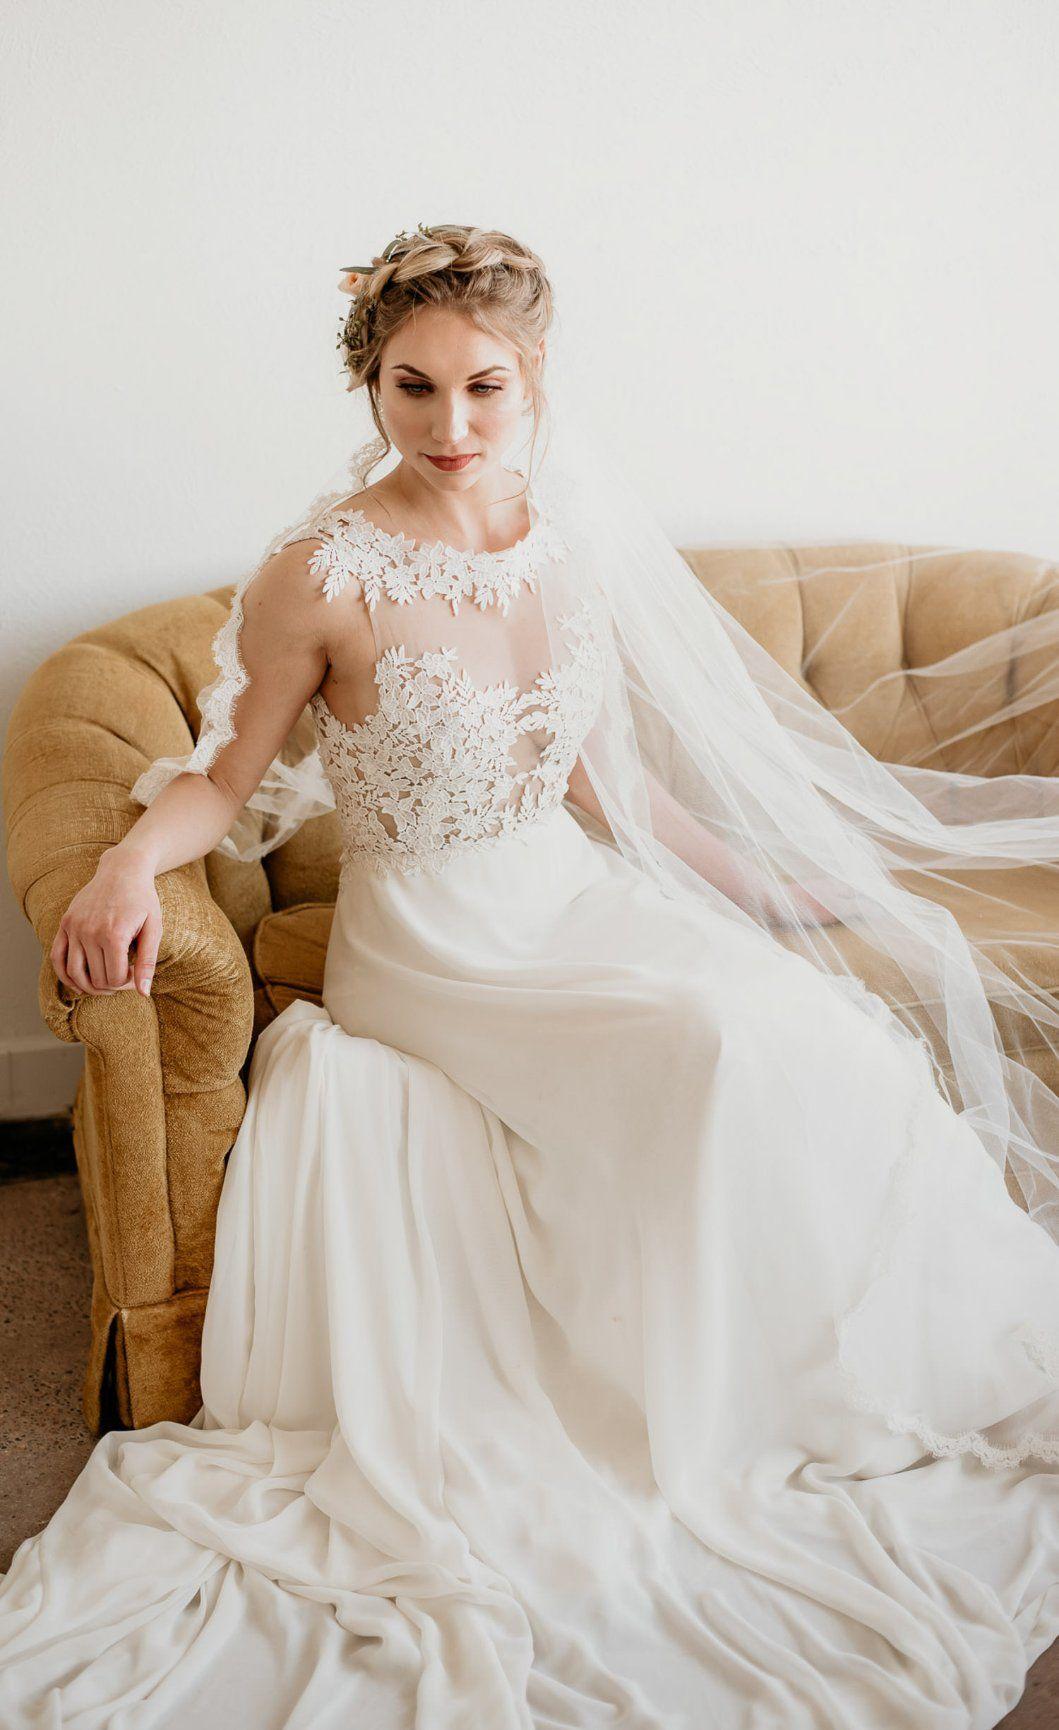 Colorado Wedding Vendor Julia Scott of Blue Bridal